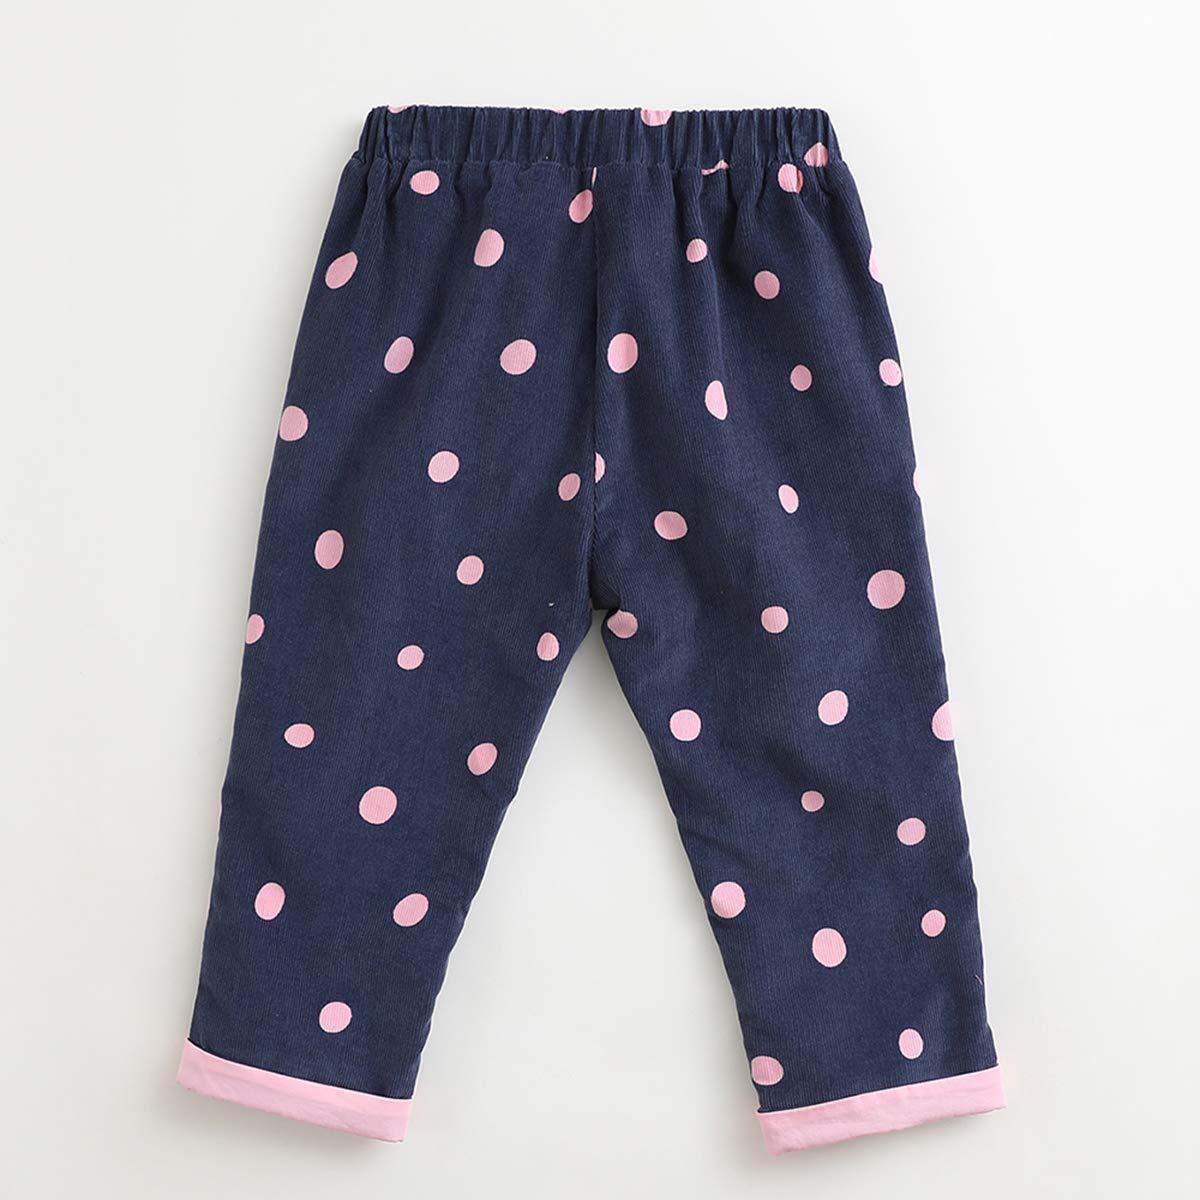 marc janie Little Girls Autumn Pink Polka Dots Corduroy Pants